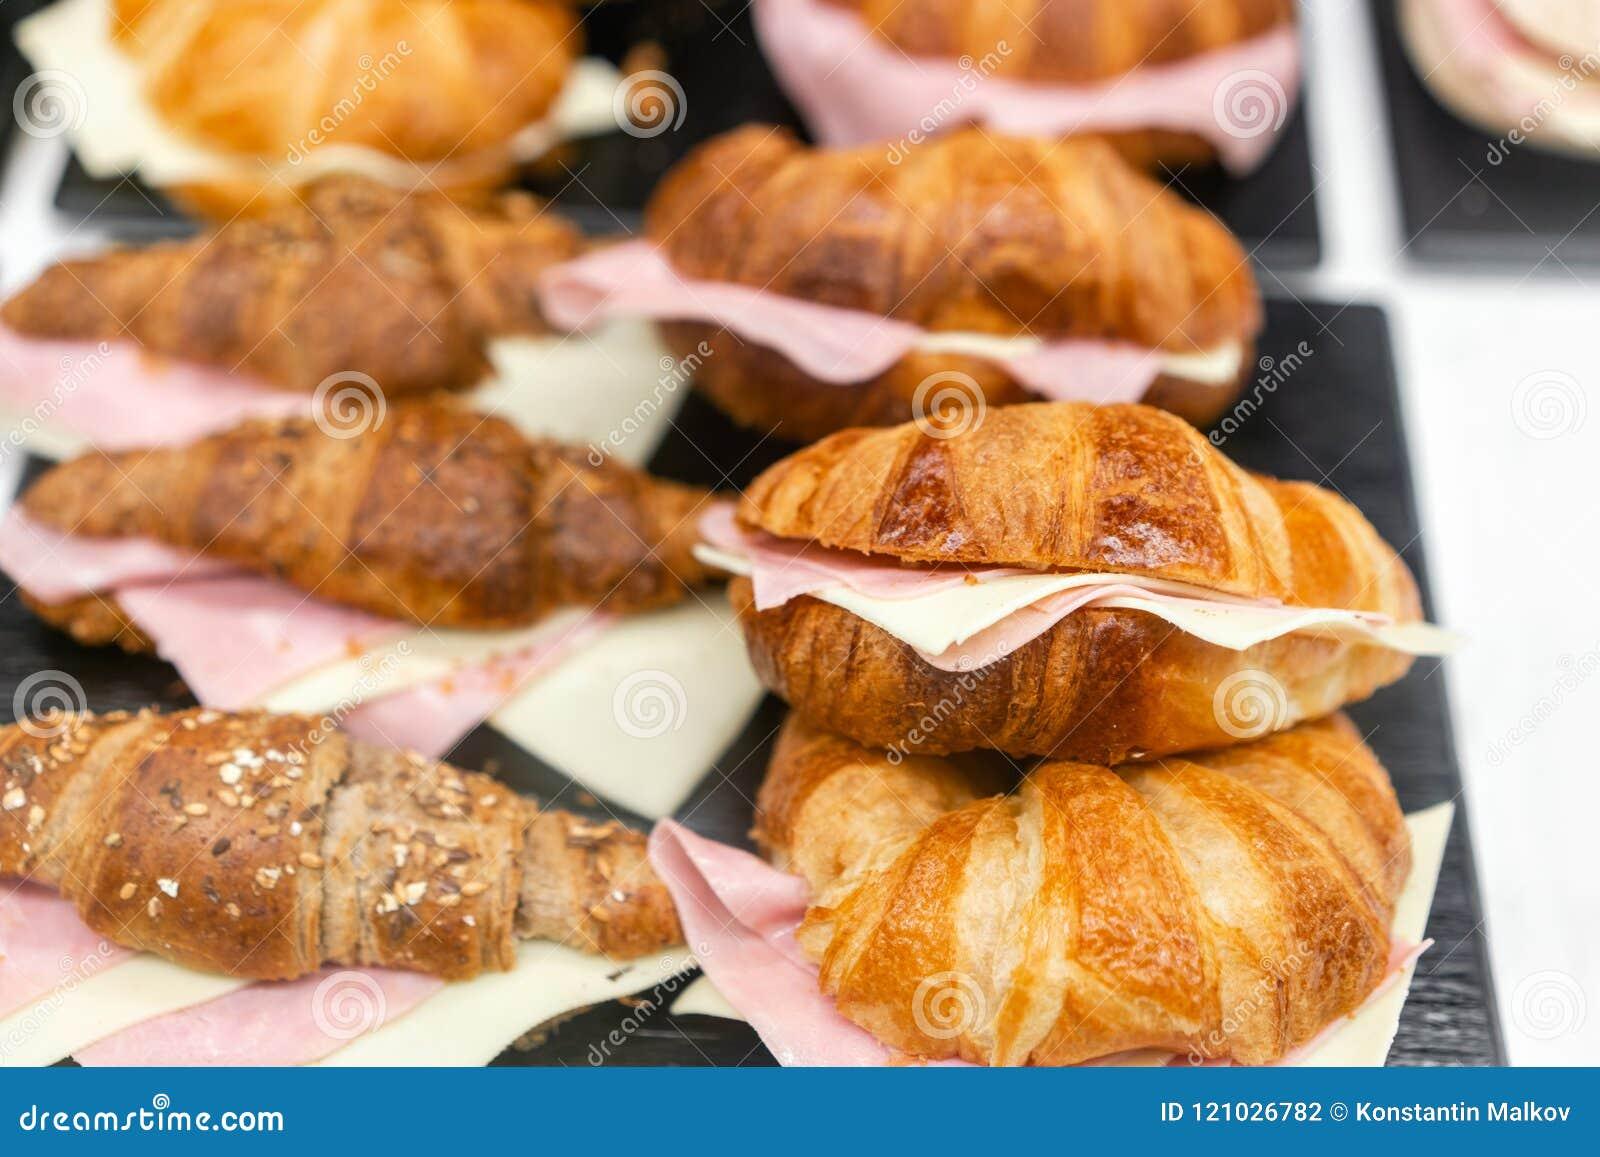 Croissant με το ζαμπόν και το τυρί Οι καυτές ζύμες βρίσκονται στο ράφι στον καφέ Κουλούρια και bagels στο κατάστημα